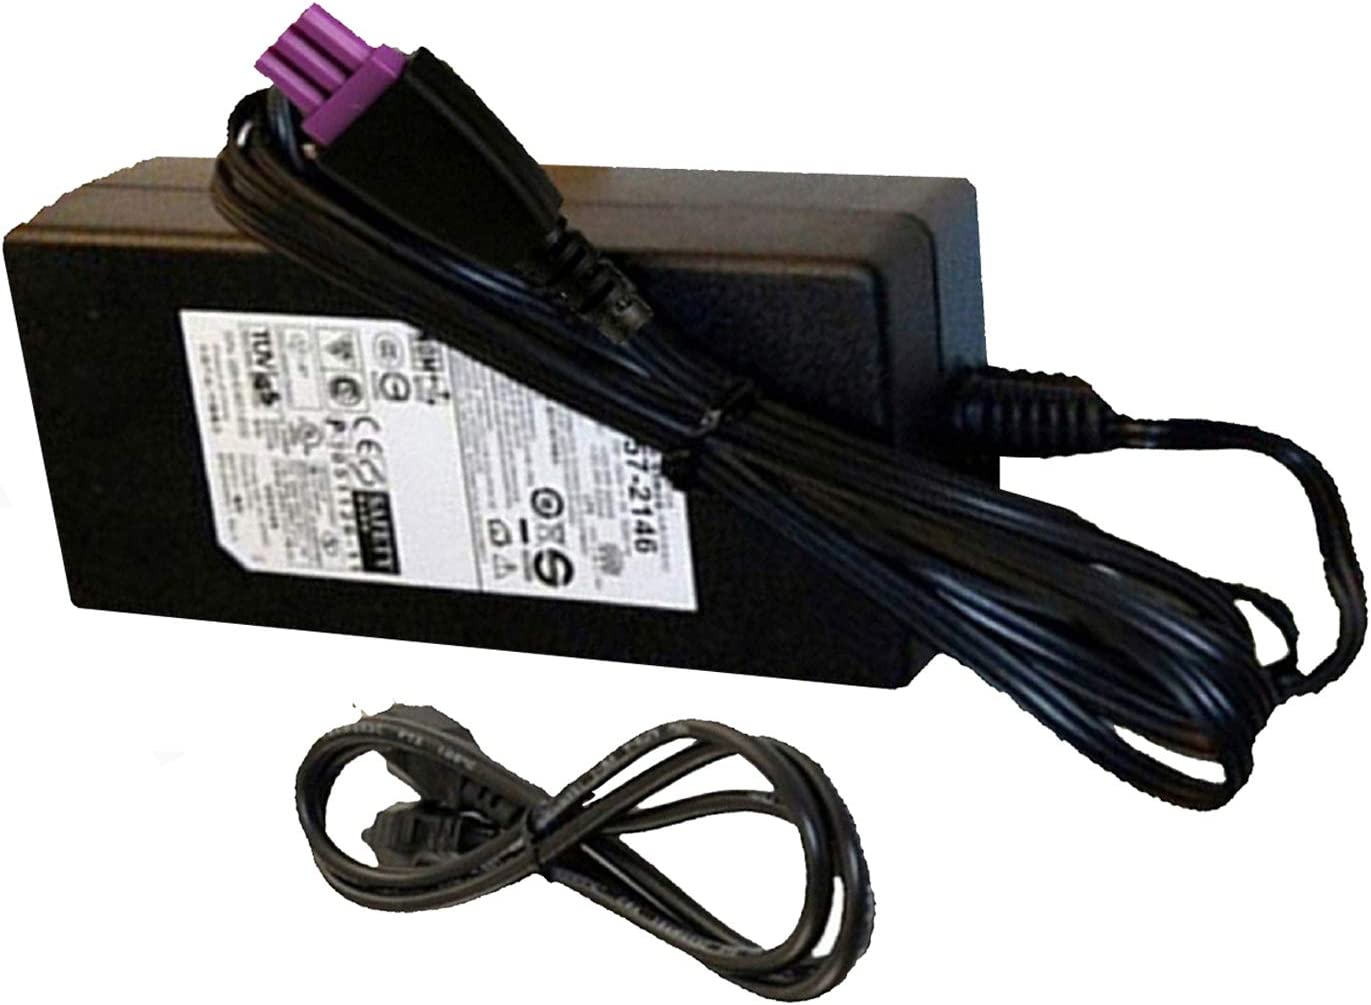 UpBright AC/DC Adapter Compatible with HP 0957-2479 ScanJet Pro 3500 F1 4500 fn1 3000 s3 Enterprise Flow 5000 S2 S3 7000 s2 Scanner L2738A L2715A#BGJ SHNGD-1401-00 L2741A#BGJ L2749A L2749A#BGJ L2730B